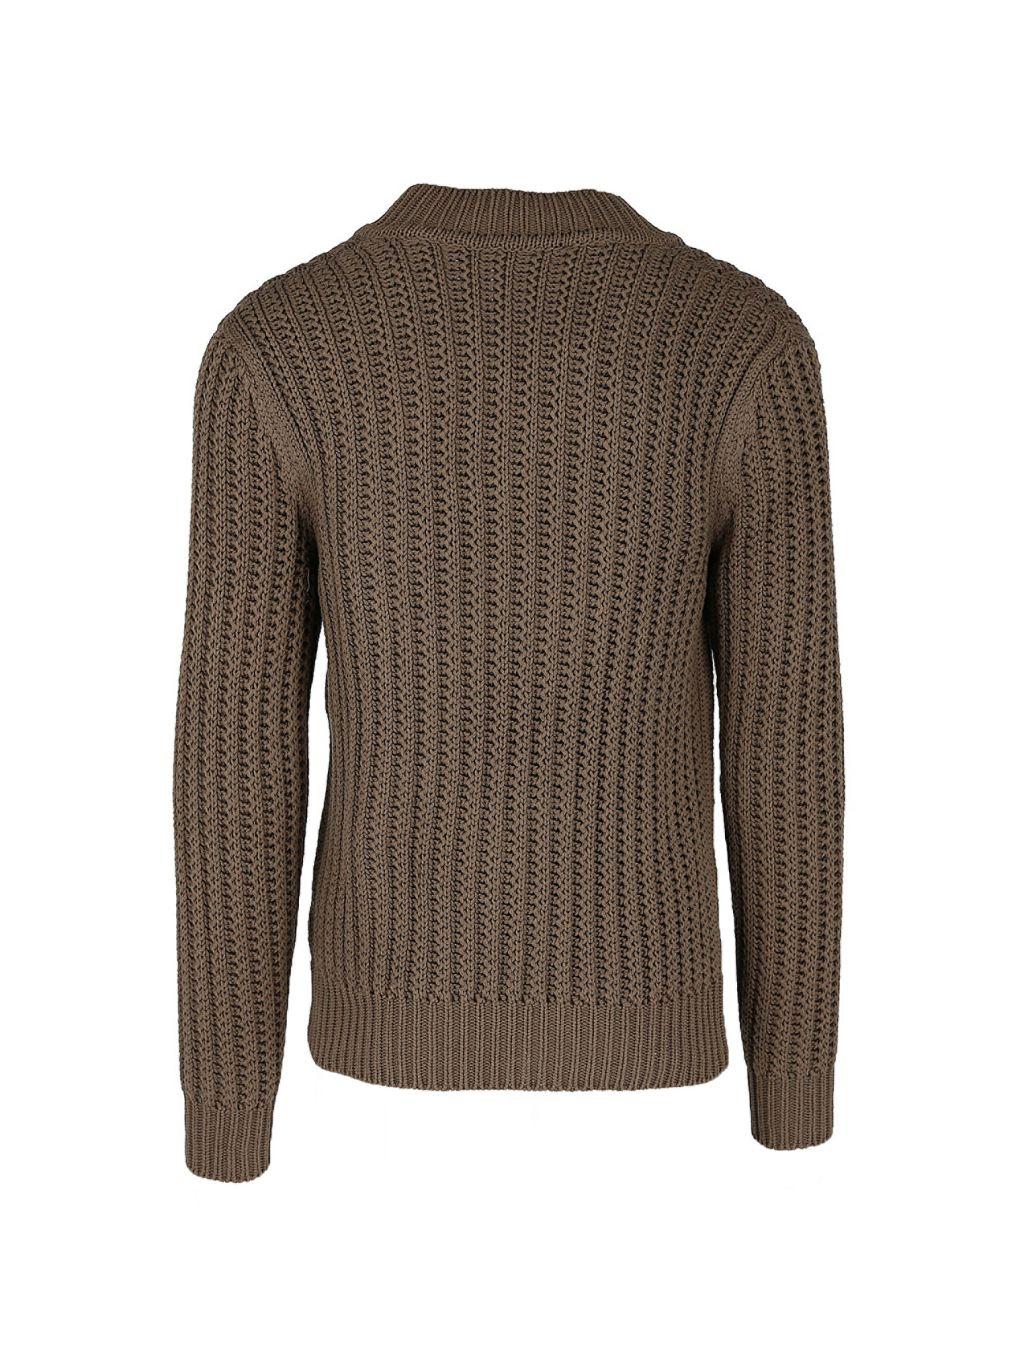 Dunhill Knit V-Neck Silk Sweater